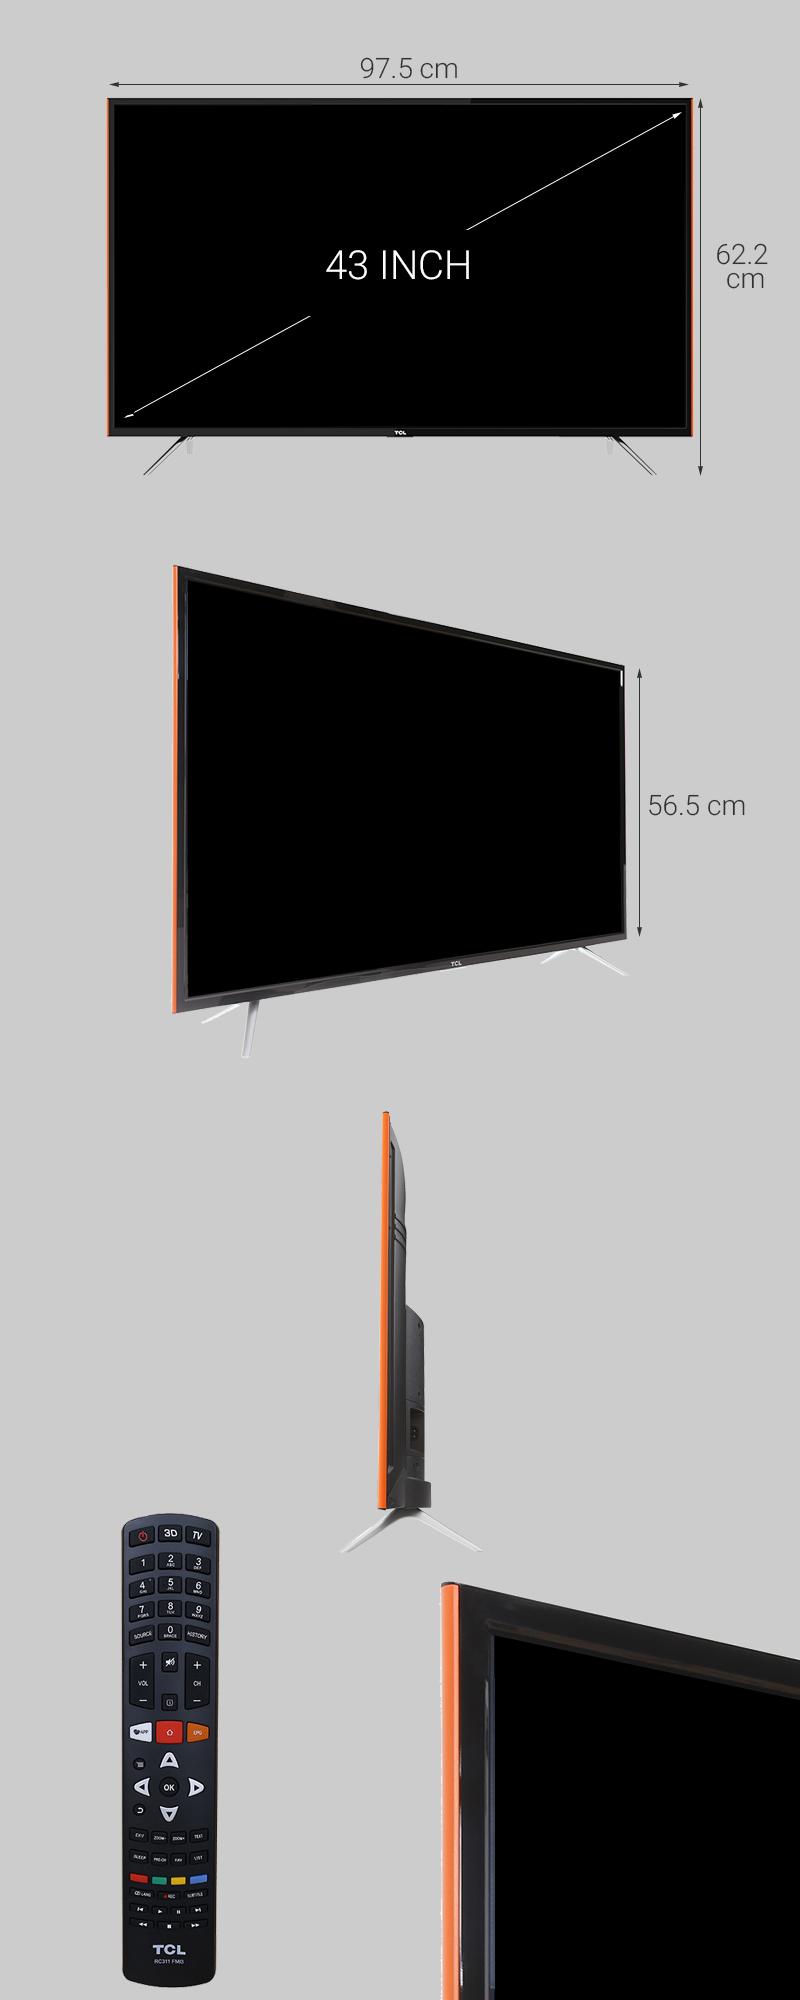 Smart Tivi TCL 43 inch L43S6100 - Kích thước tivi